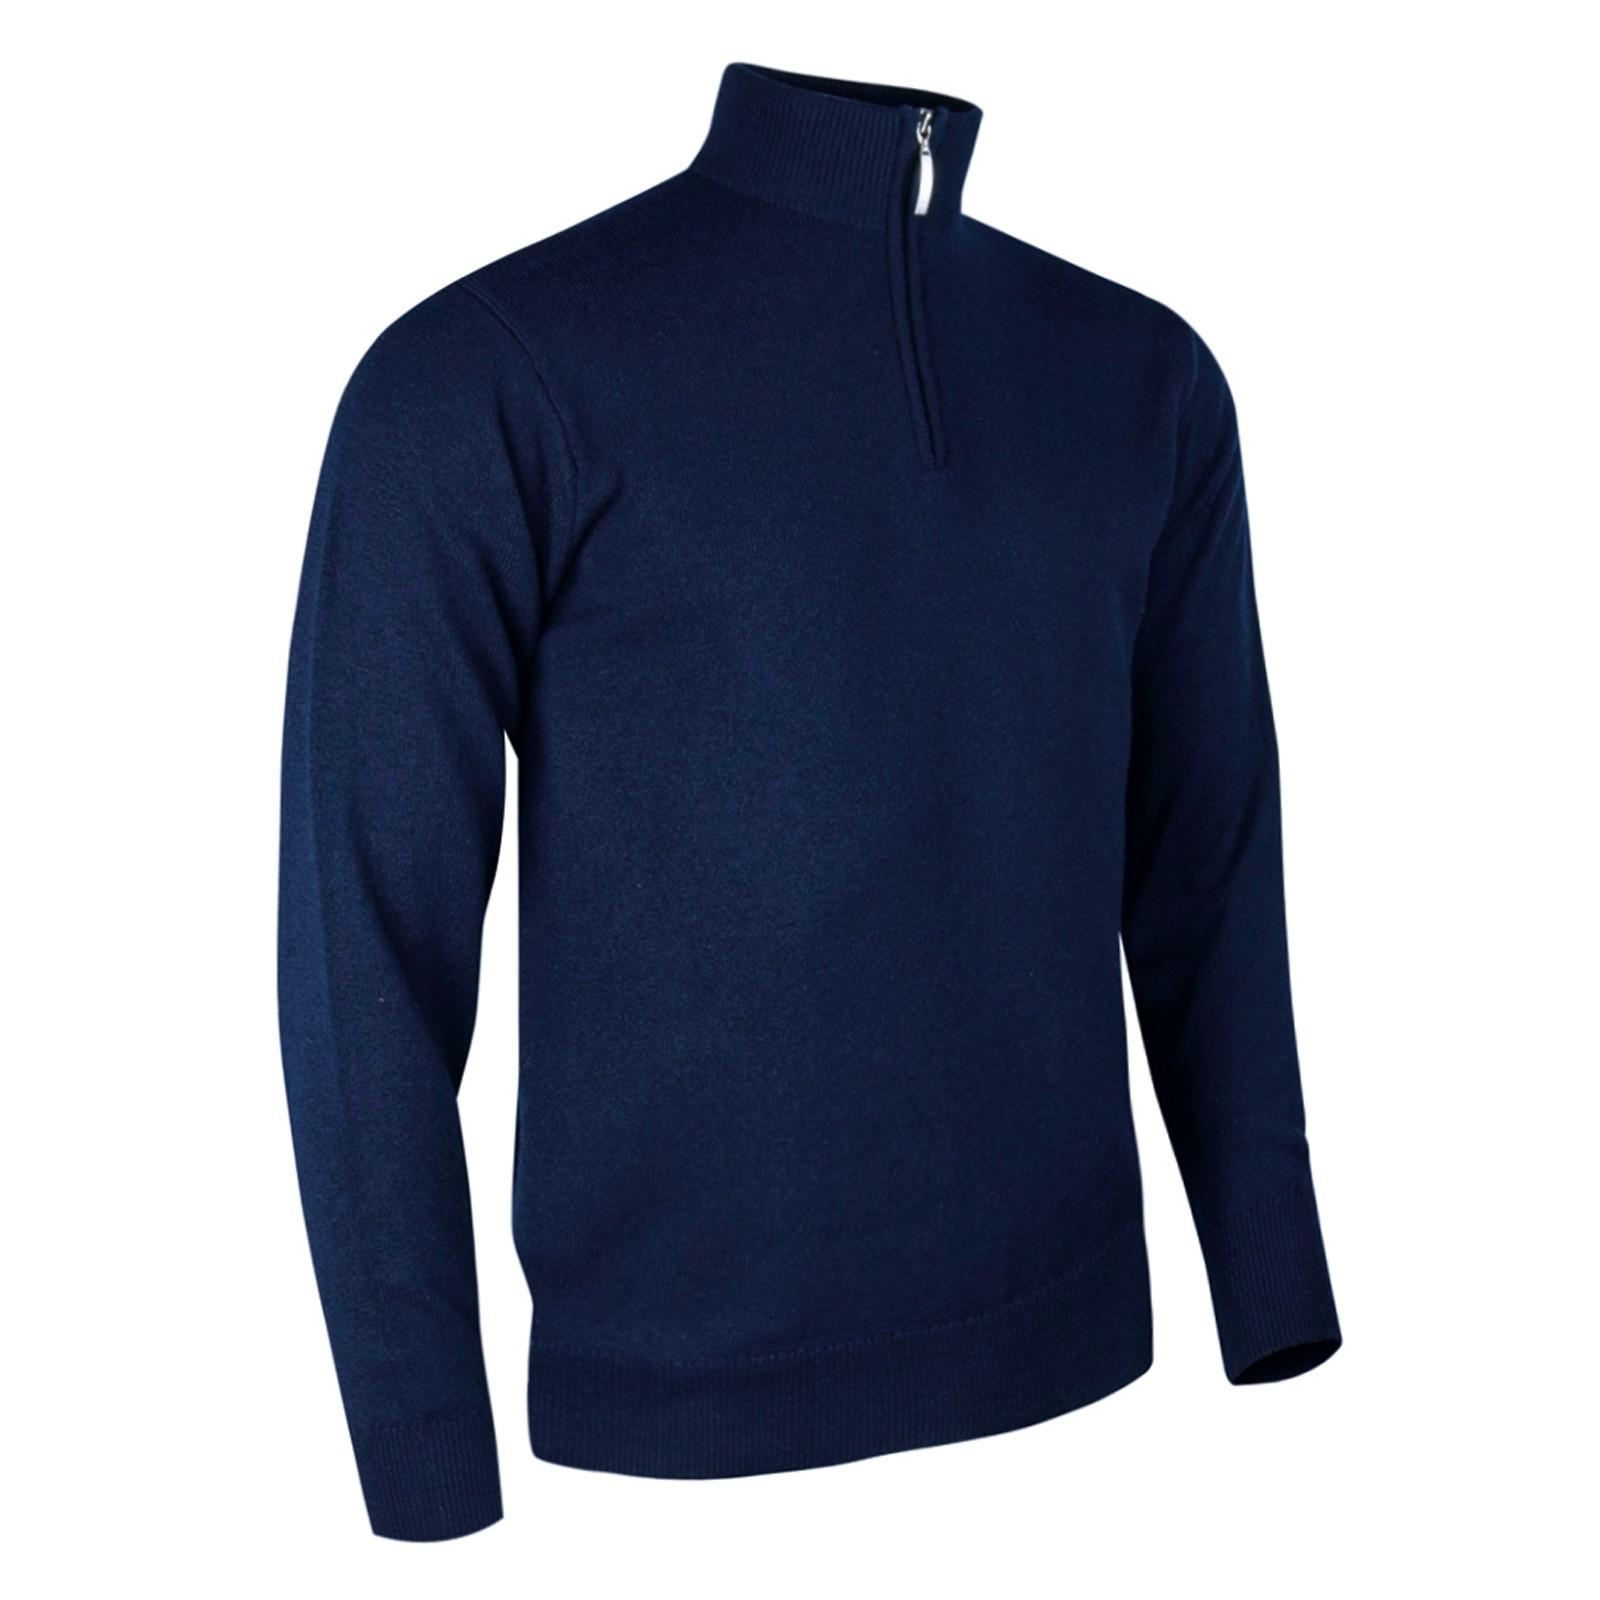 Glenmuir Samuel 1/4 Zip Sweaters